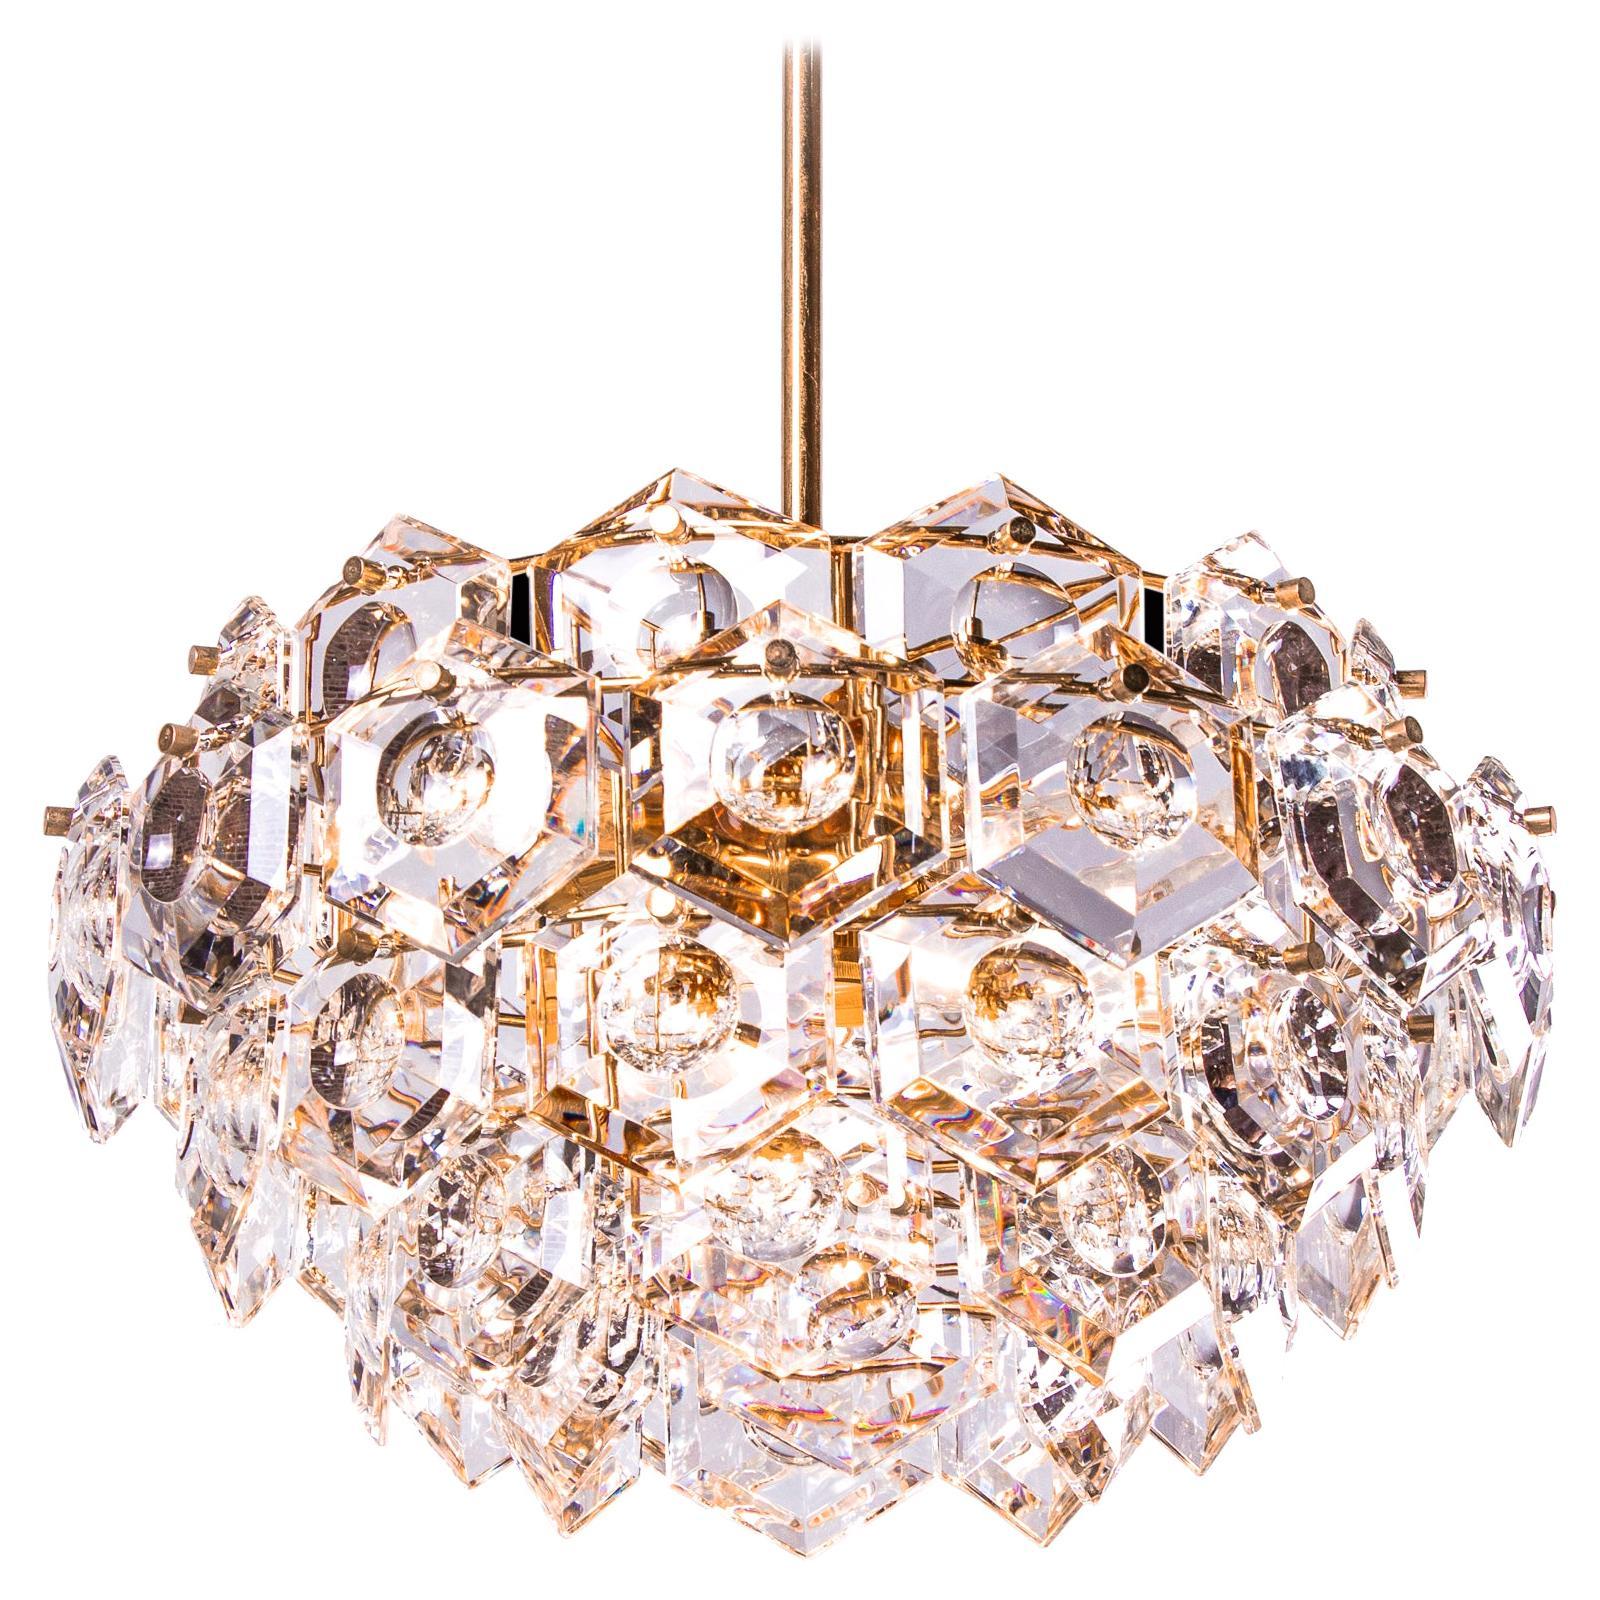 Gold-Plated Kinkeldey Chandelier Crystal & Brass, Germany, 1960s